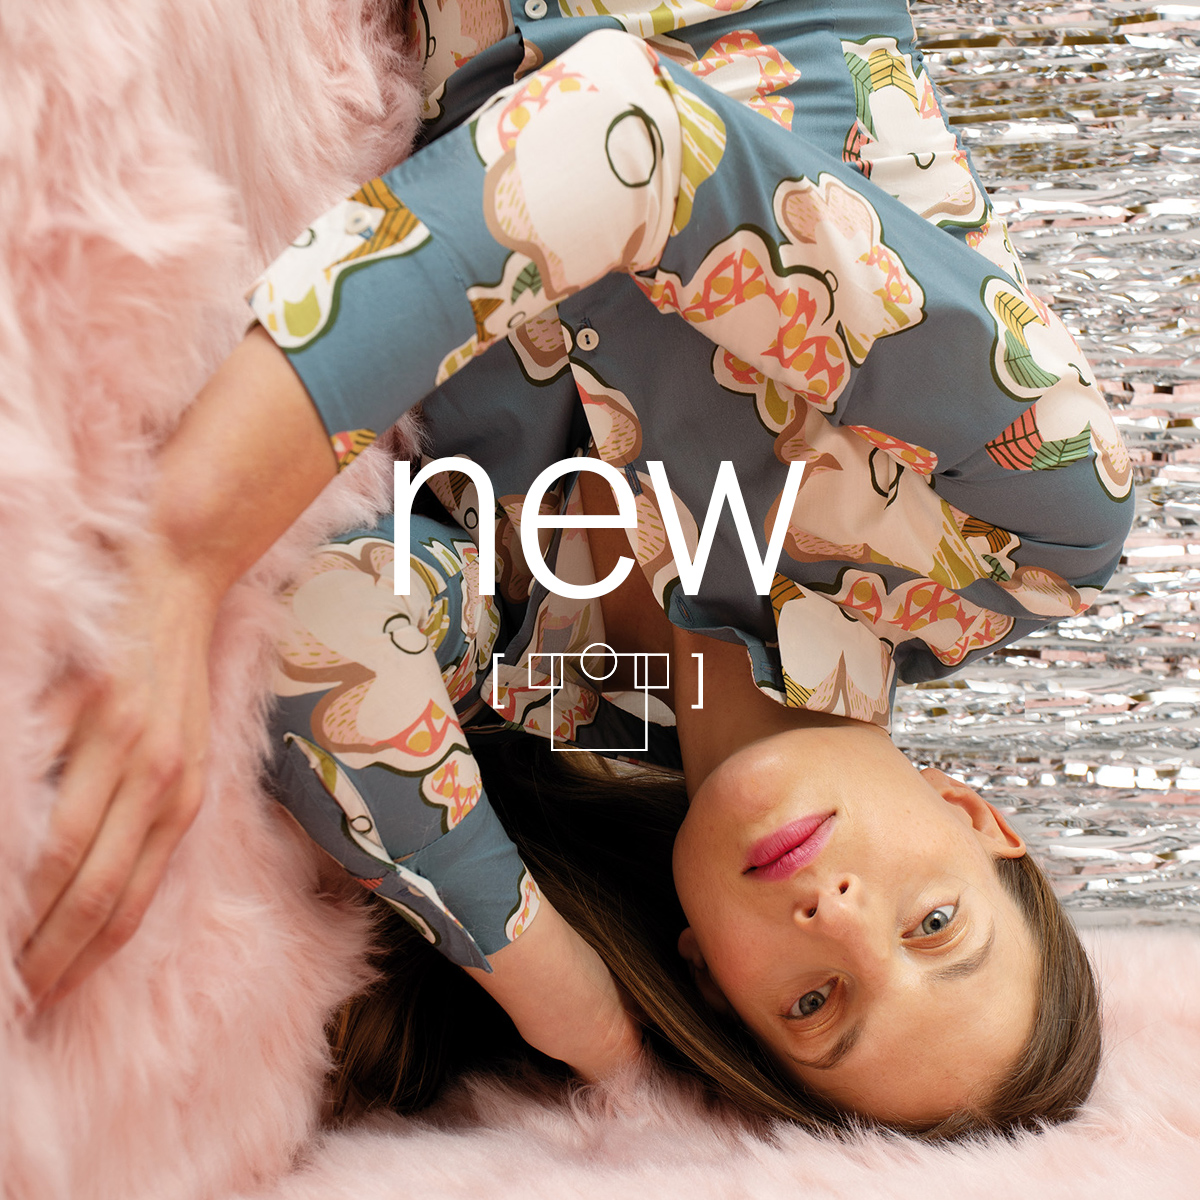 garment_W21_newseason03_renata_greengray_ZFZaXN8Nnbvhk